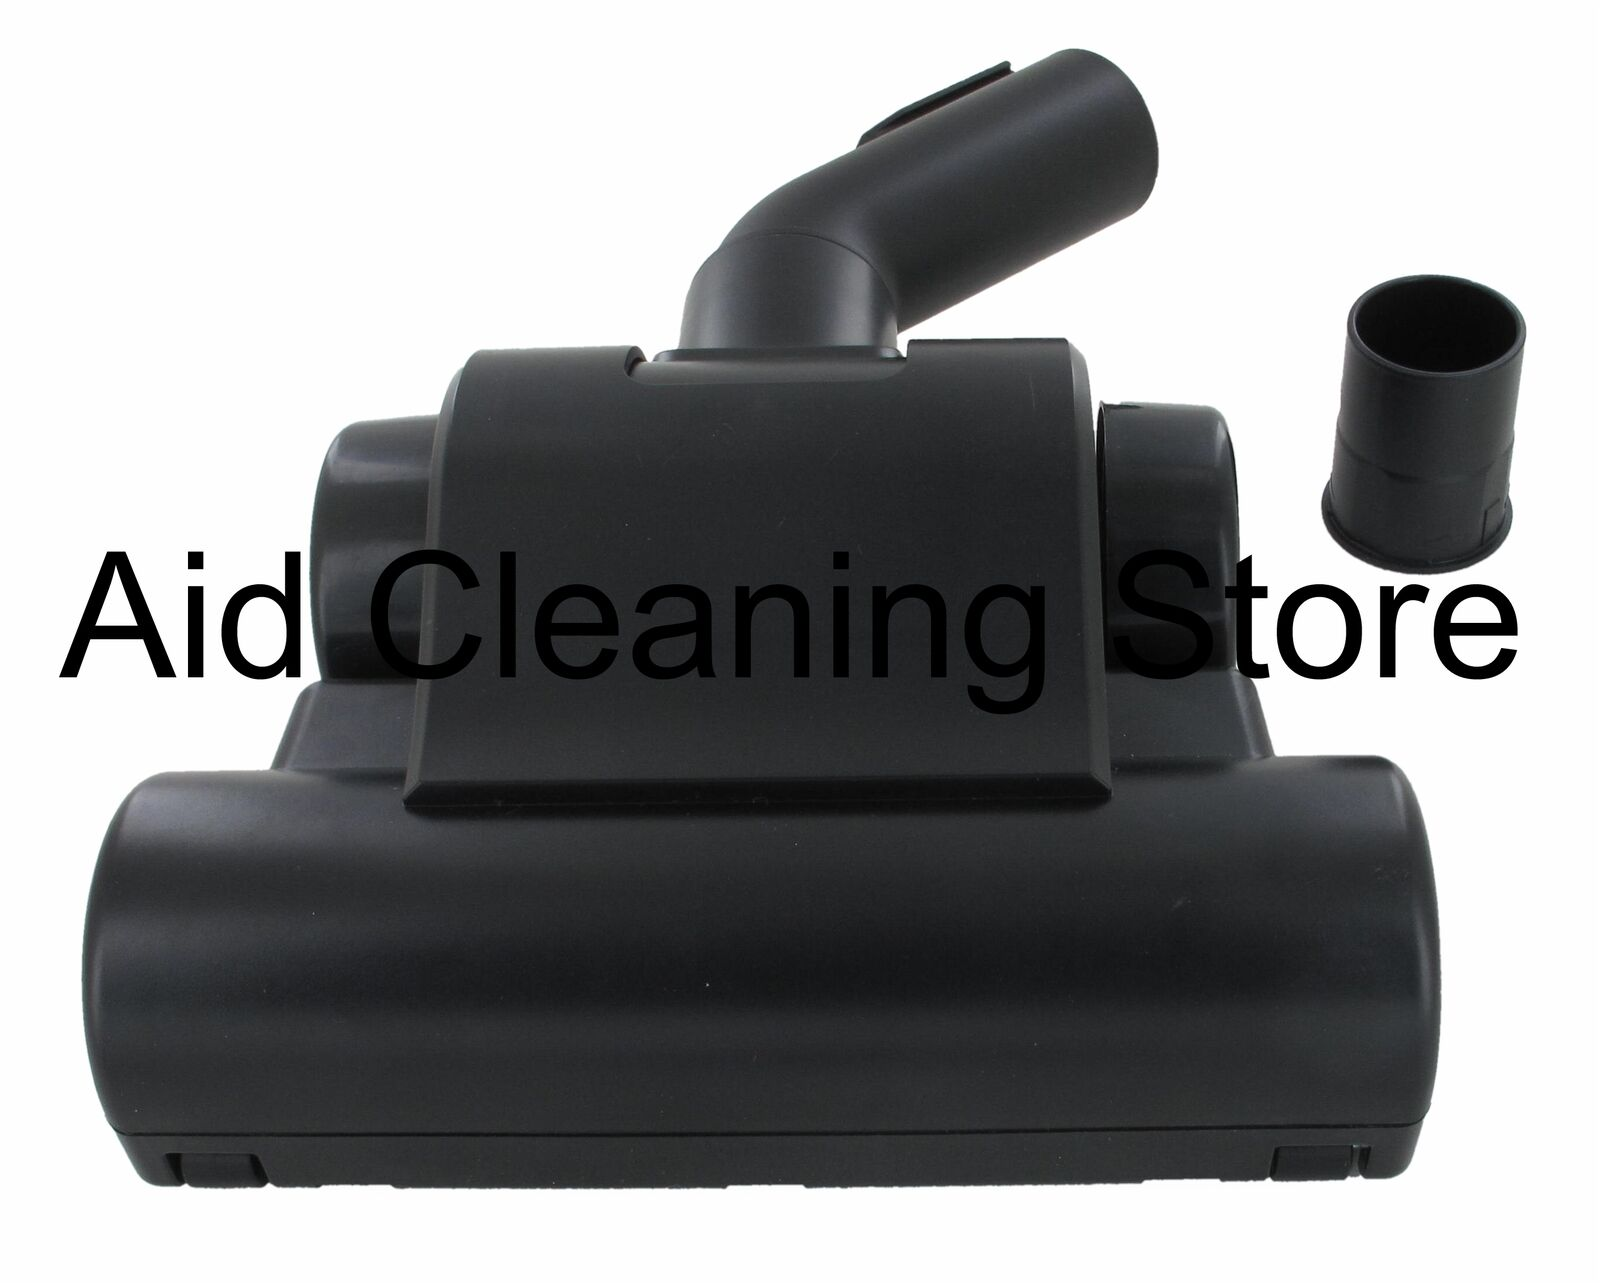 NUMATIC Henry Hetty James Vacuum Cleaner Turbo Brush Hoover Floor Tool Head 32mm